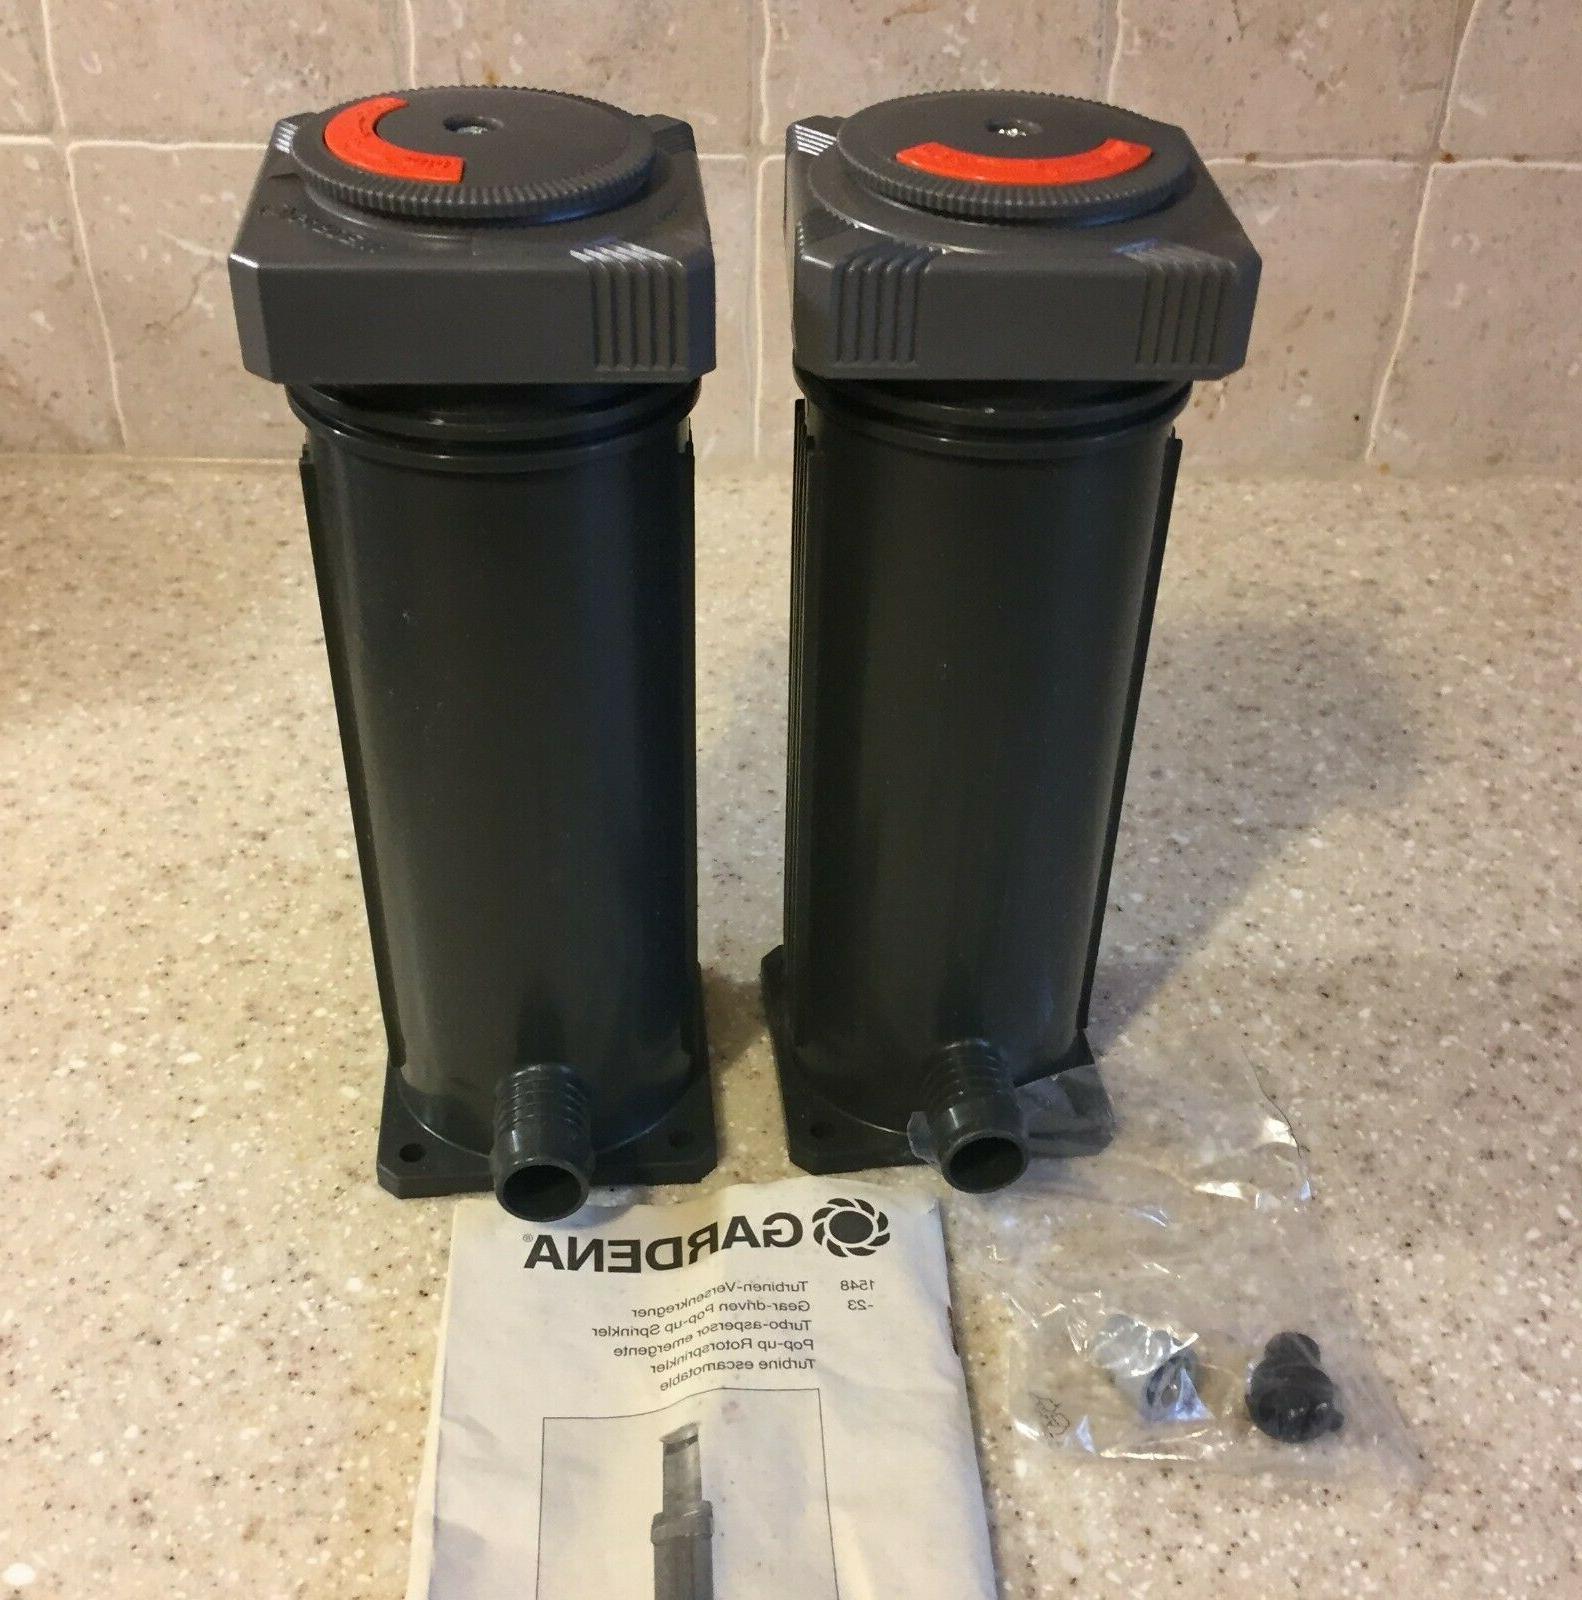 Two GARDENA Up Sprinkler System MADE IN